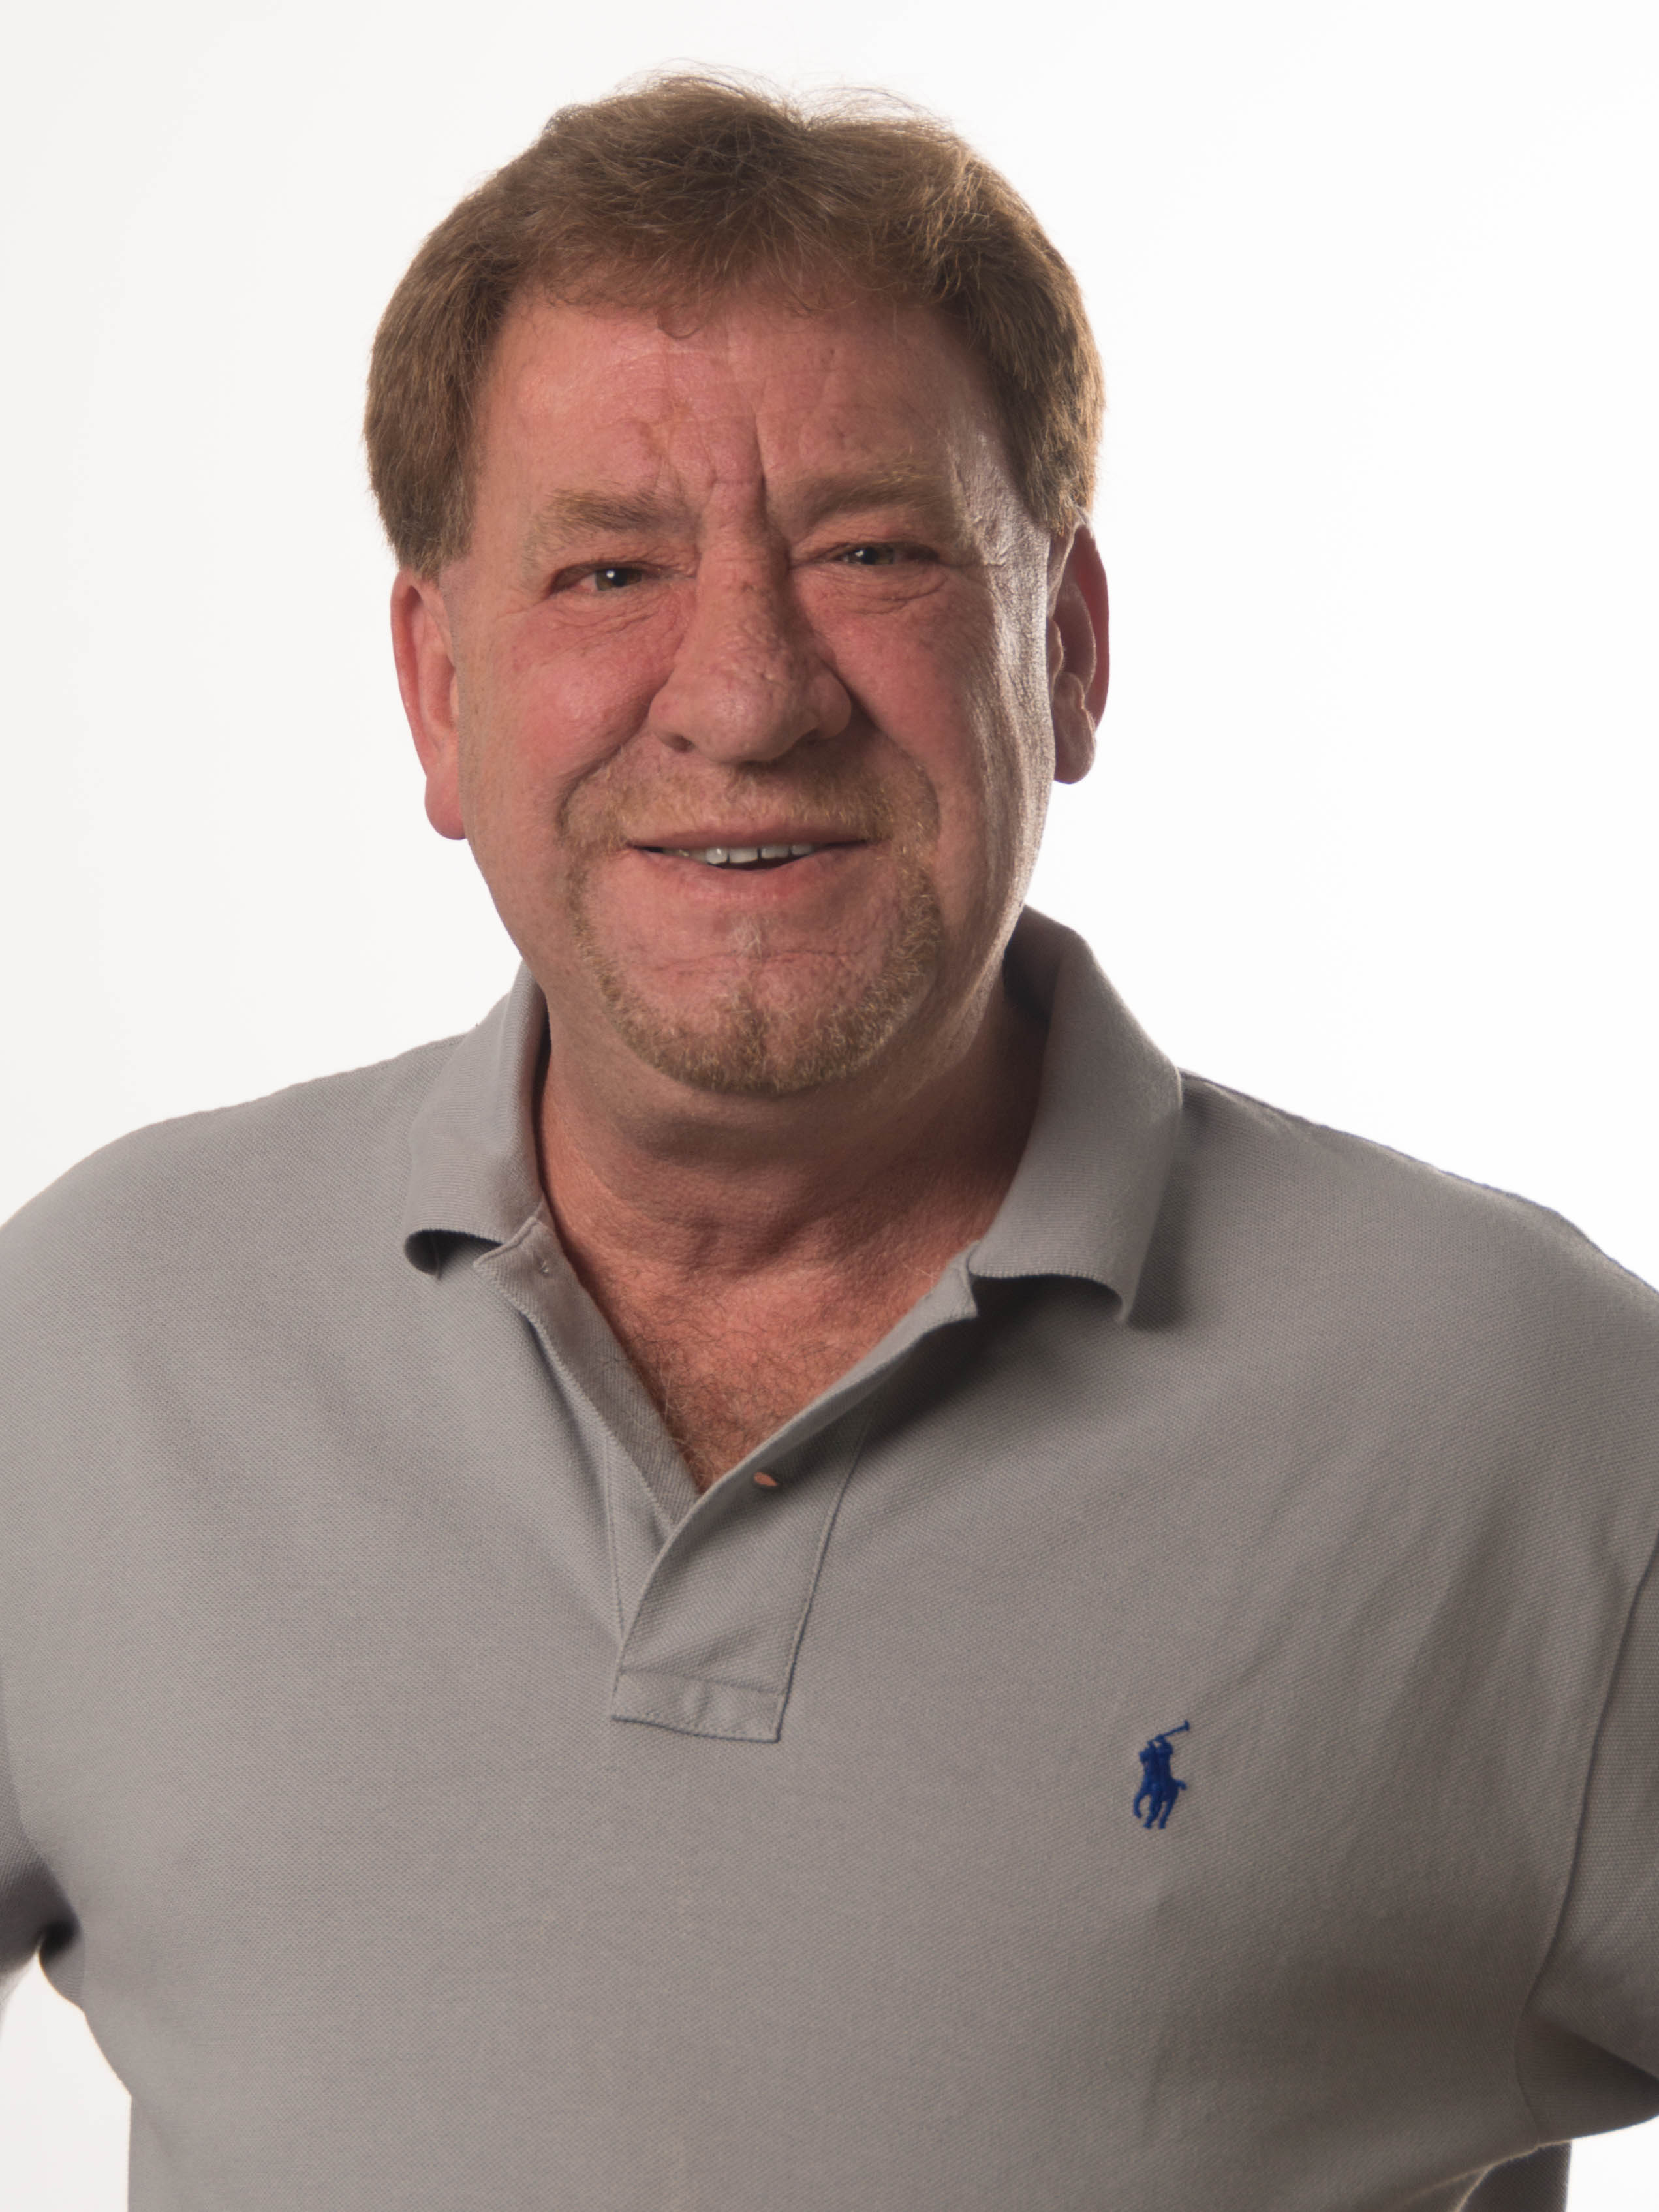 David Johanning